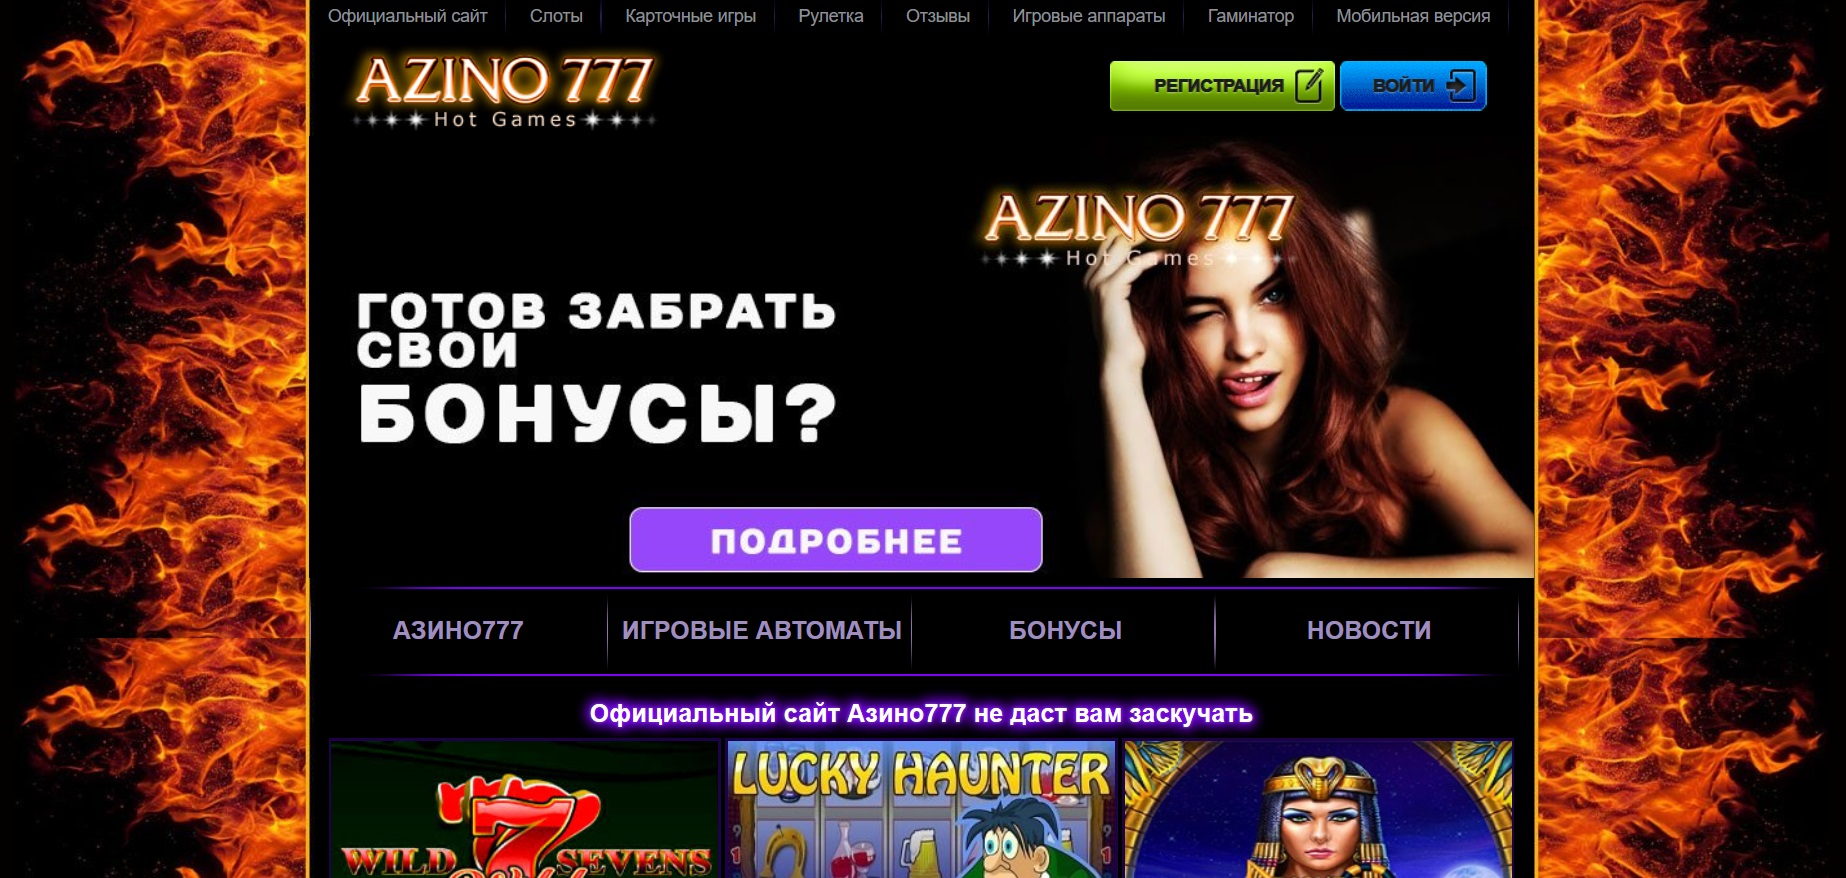 азино 777 даб бонус ру мобильная версия